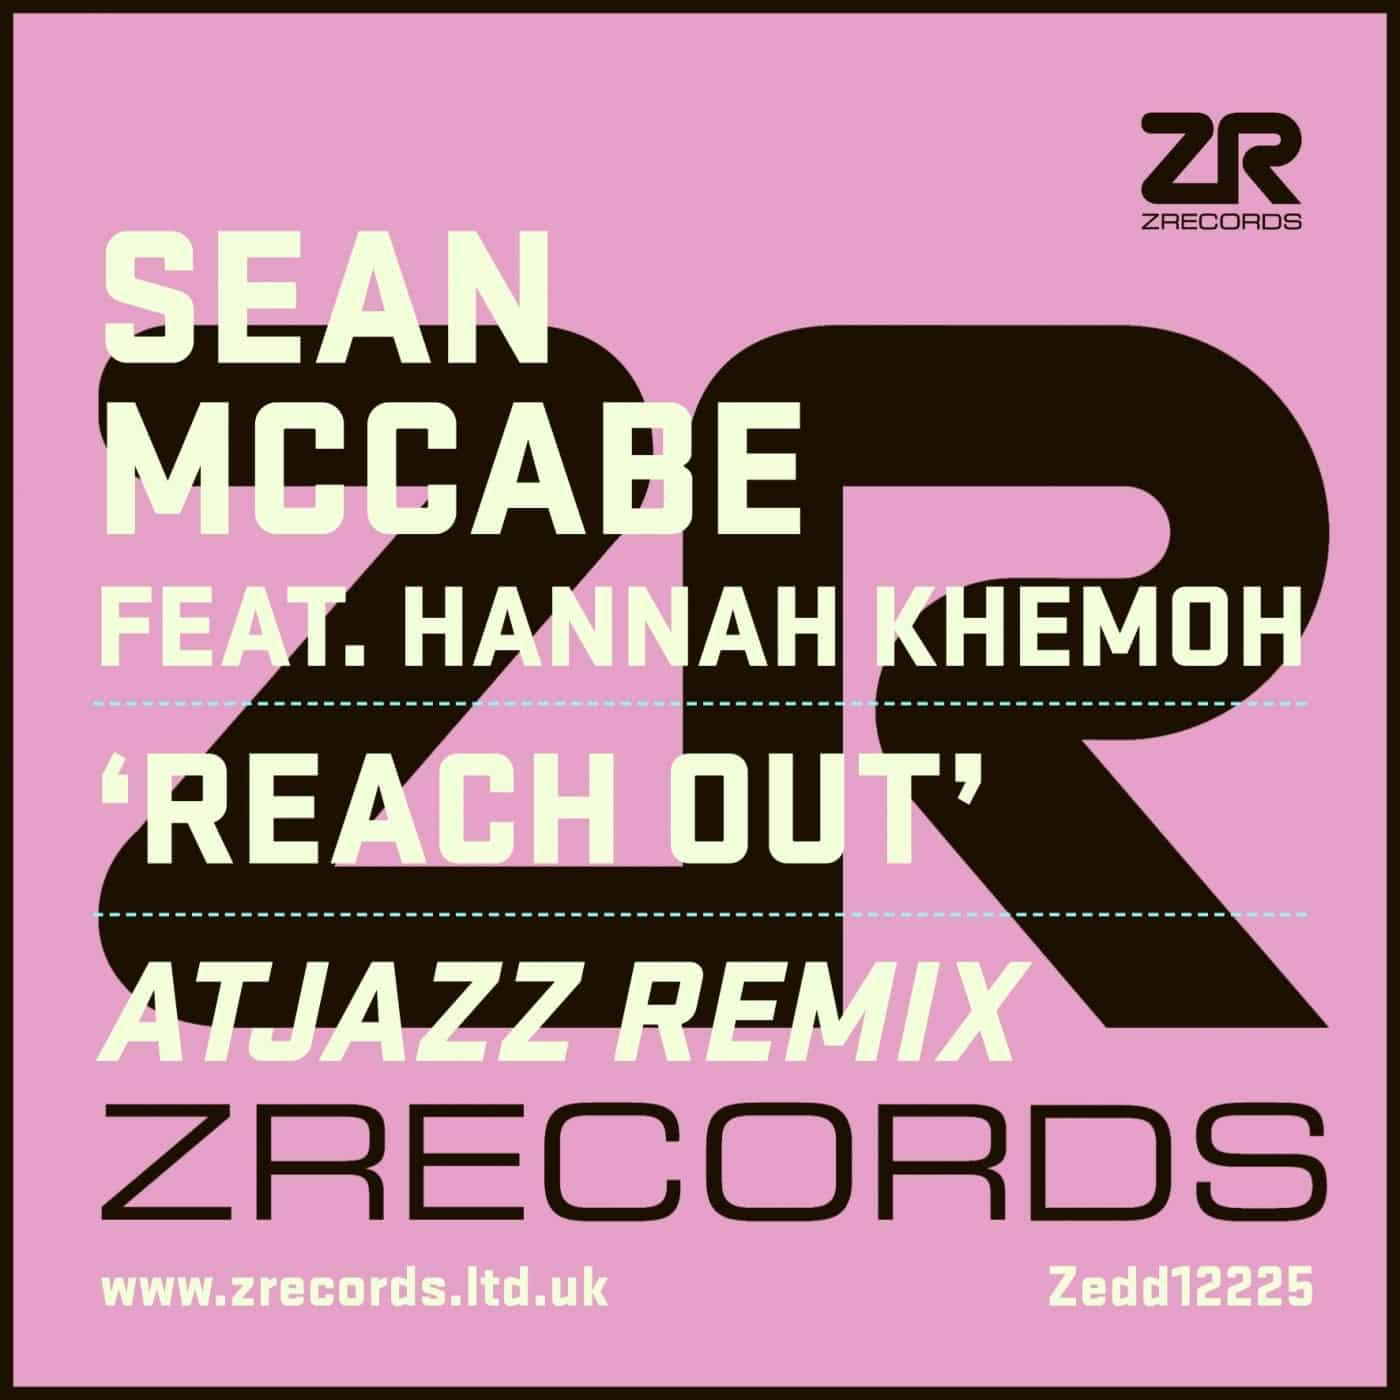 Sean McCabe feat. Hannah Khemoh Reach Out (Atjazz Remix) Rotations & Reworks